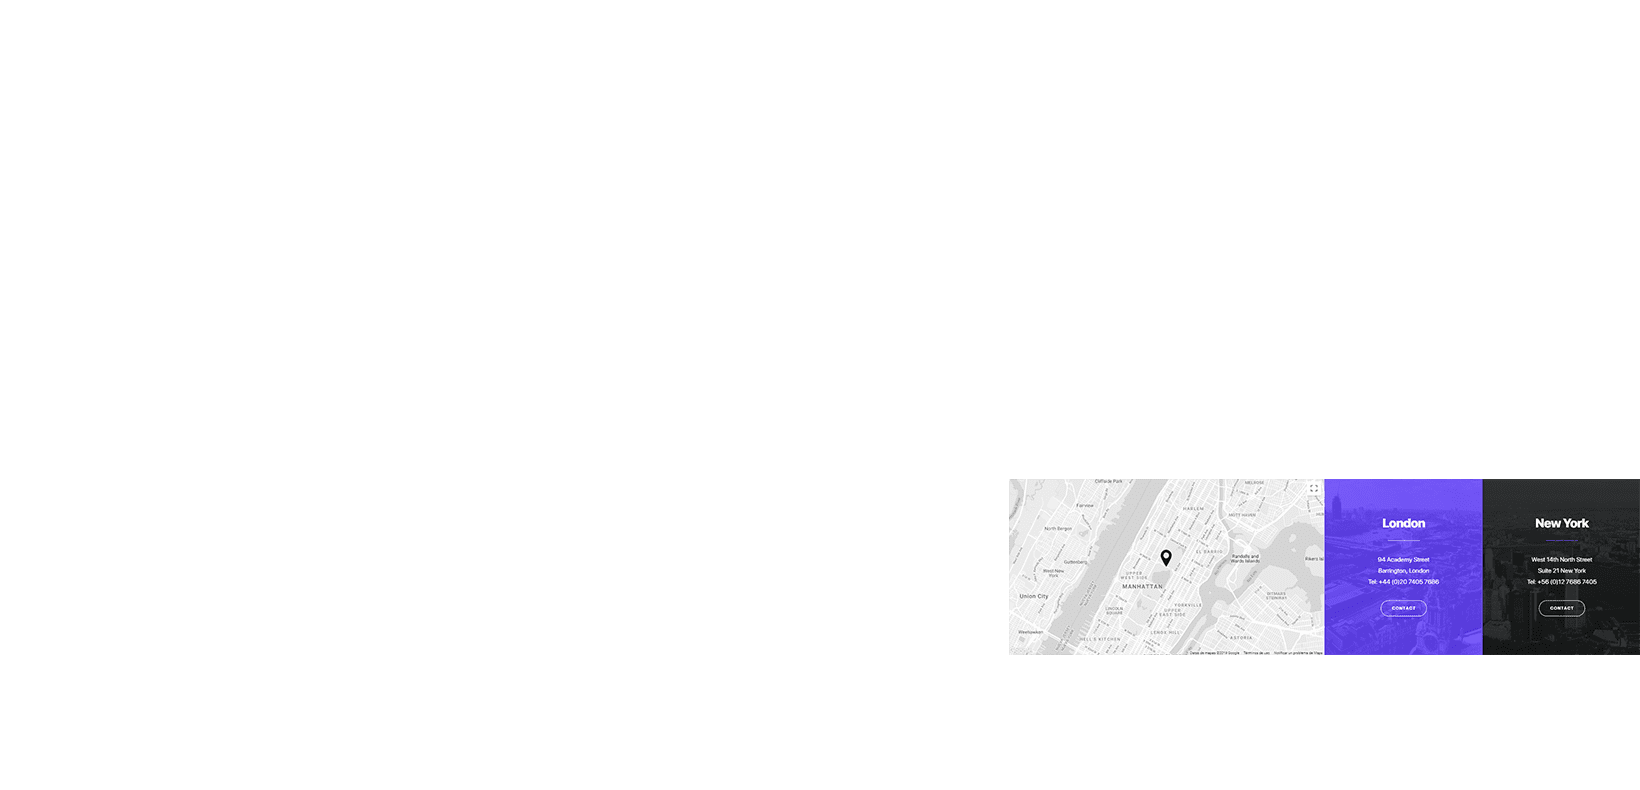 layer-image-8